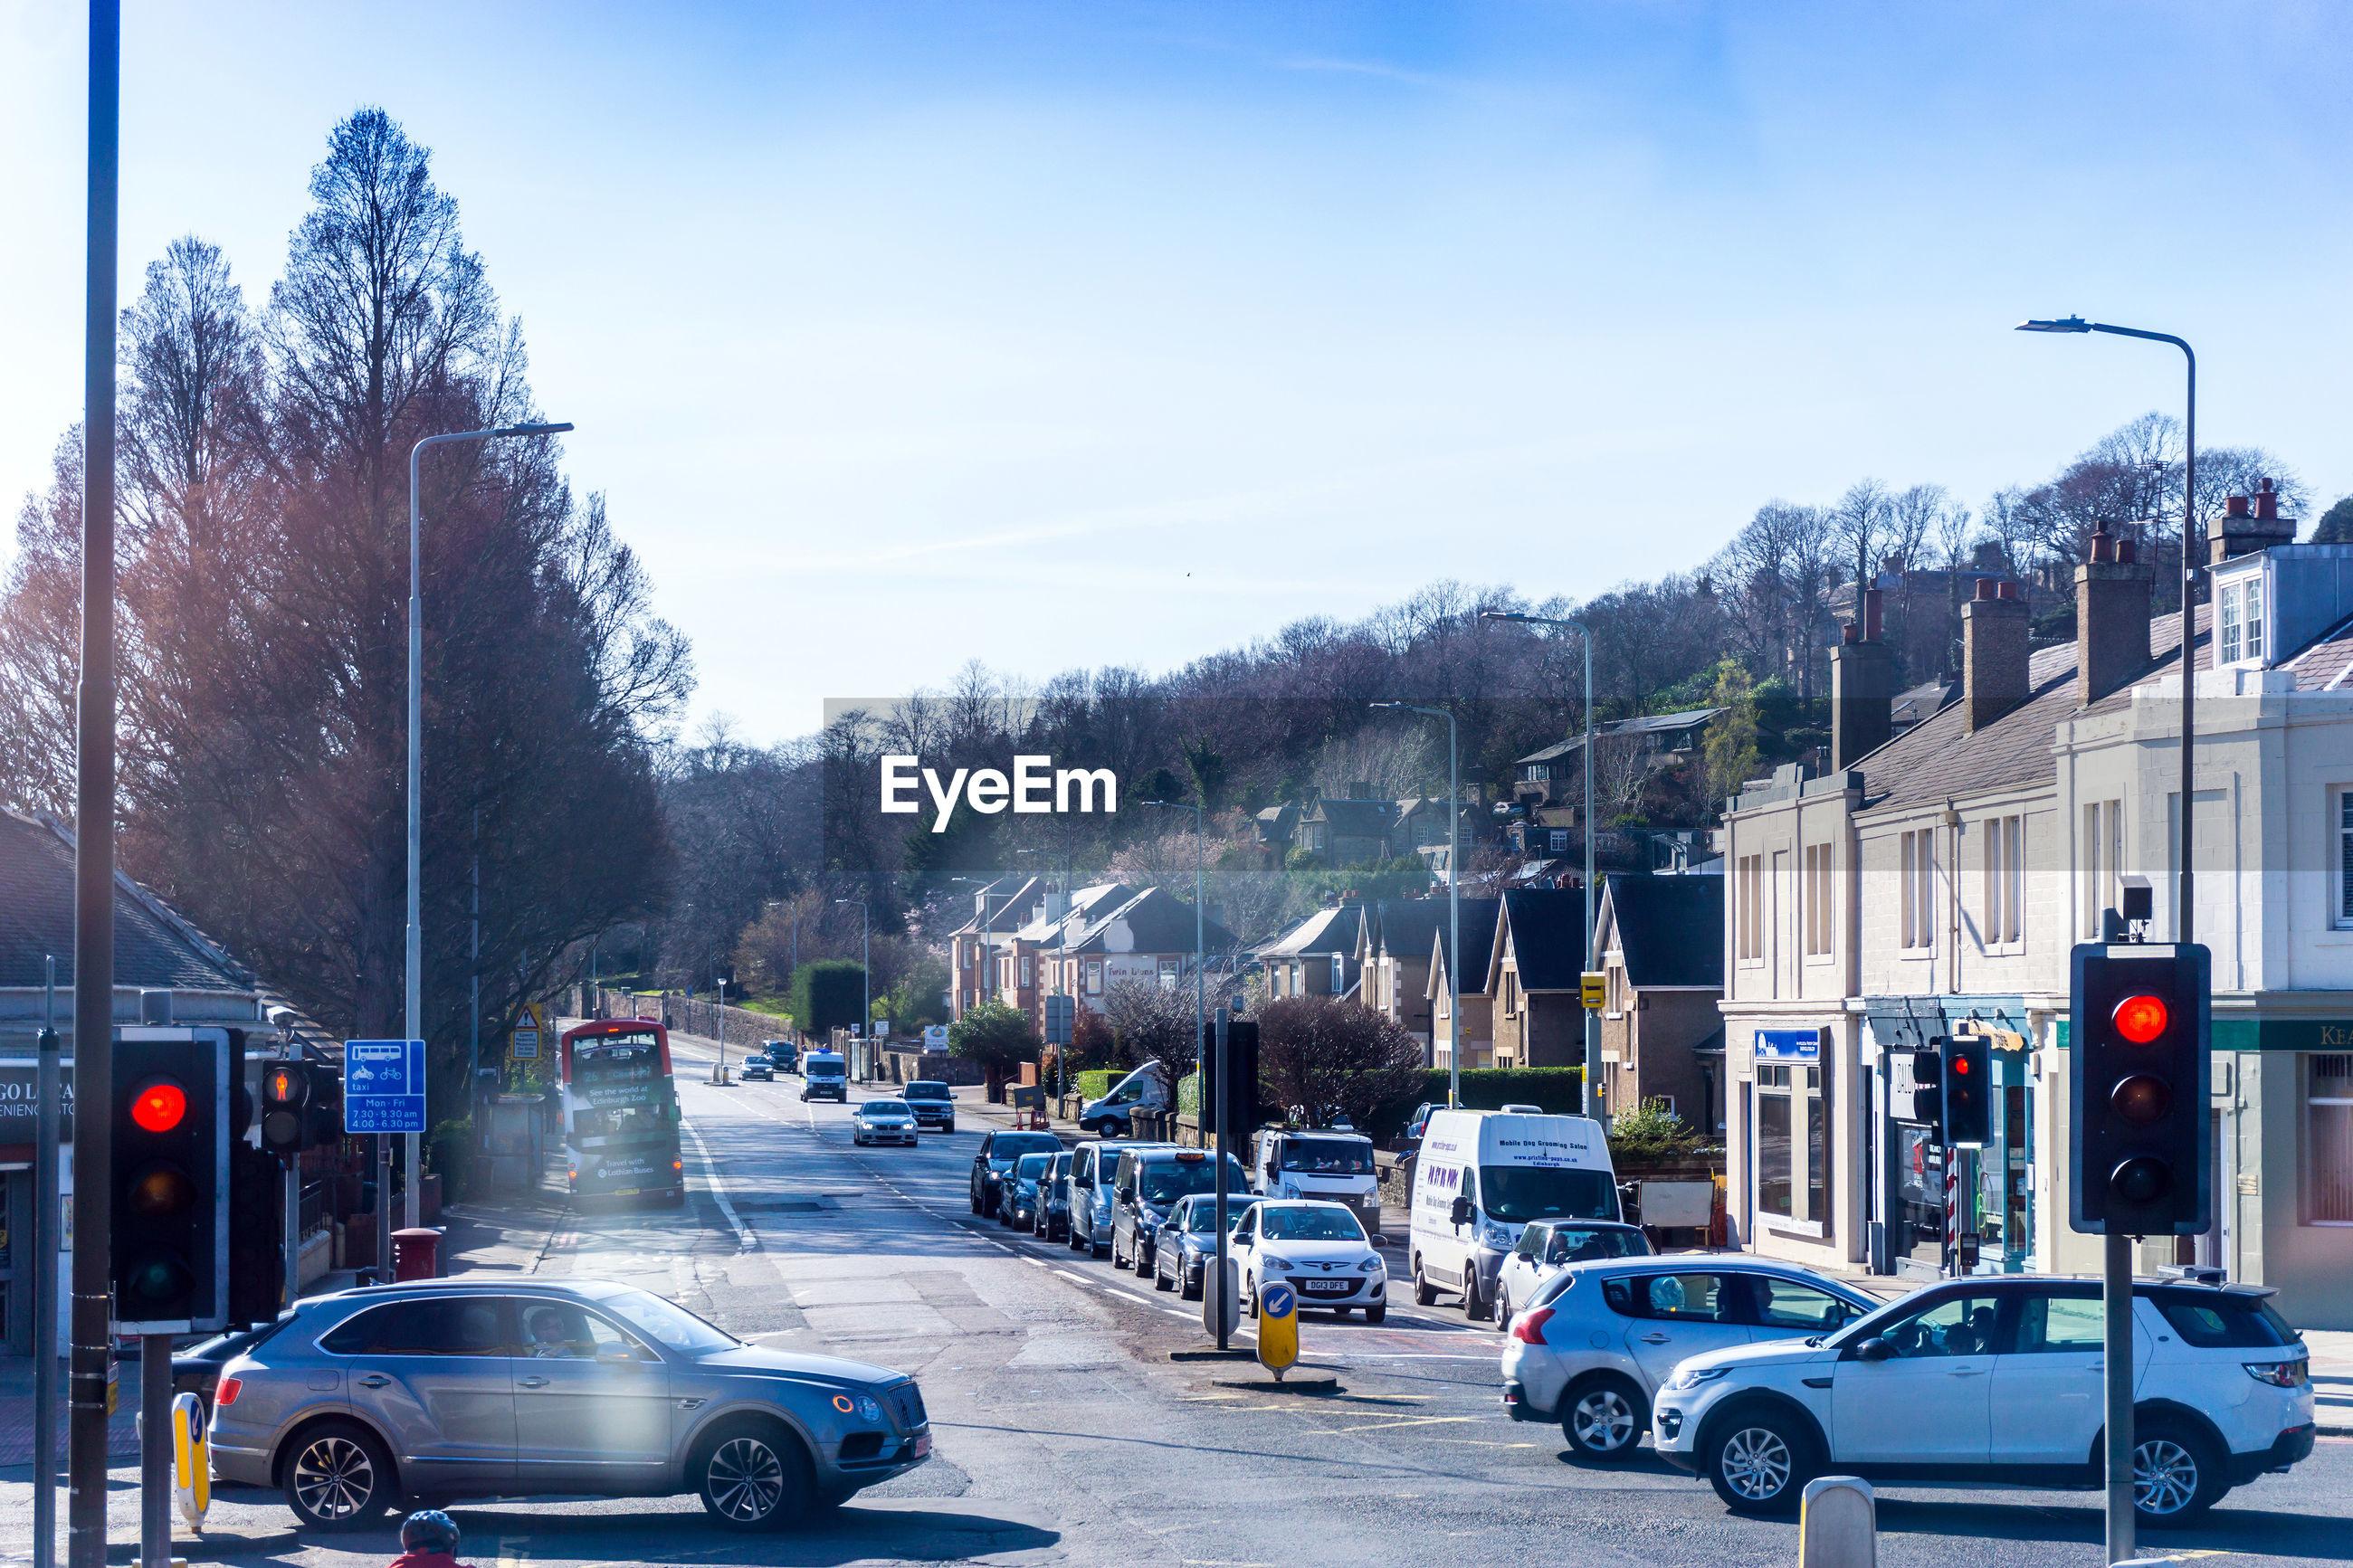 CARS ON STREET AGAINST SKY IN CITY